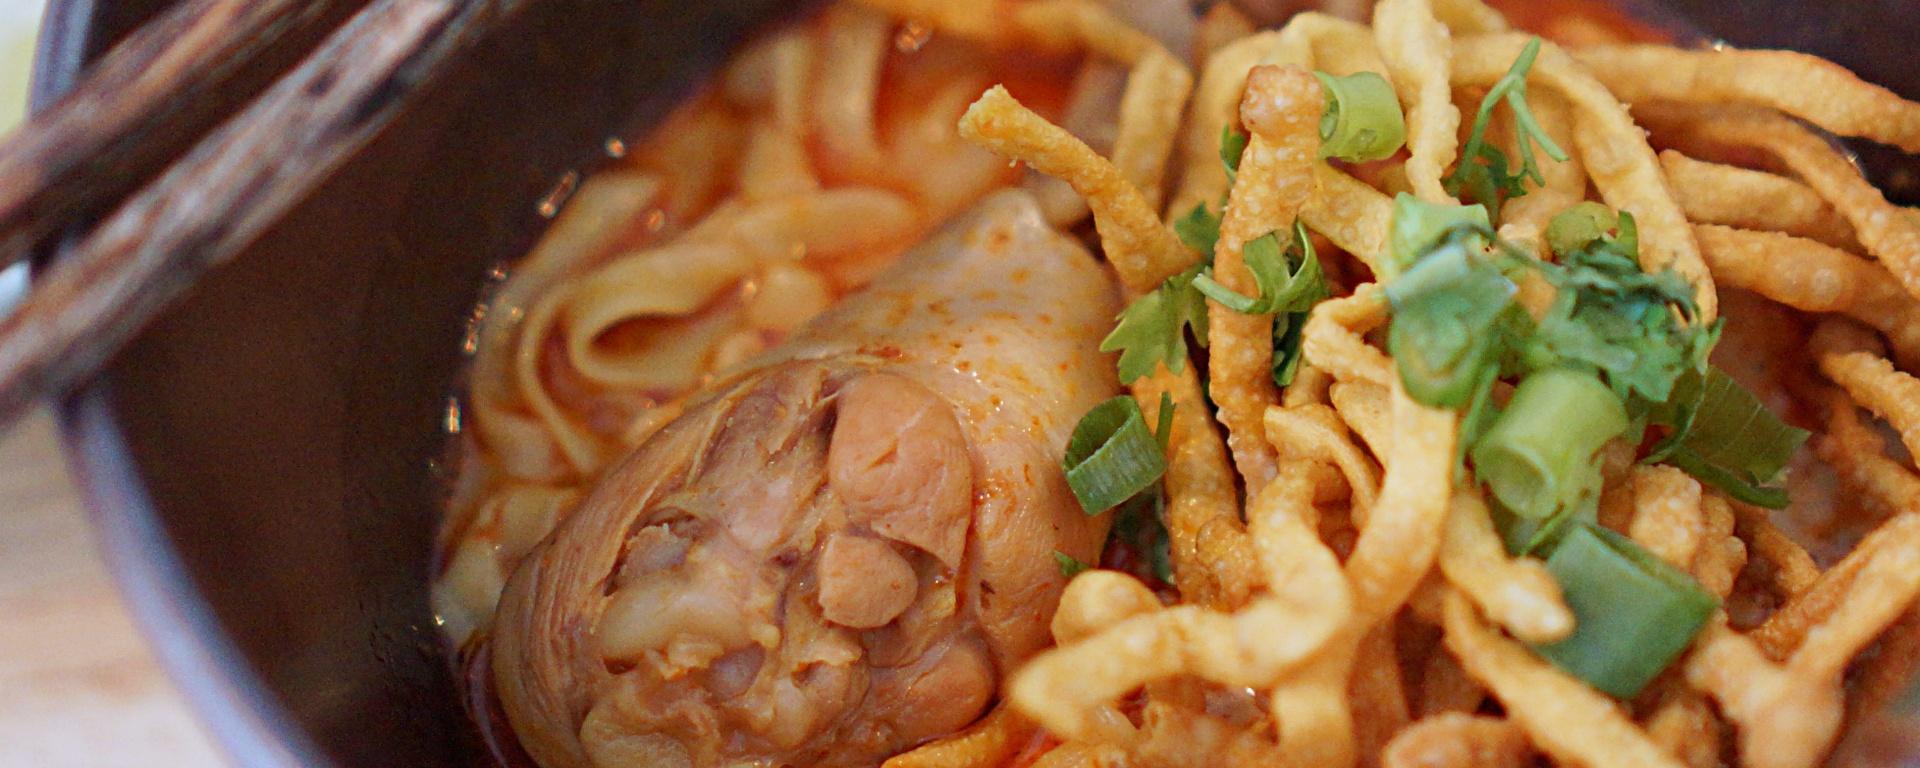 Khao Soi at KaoSoi13 Chiang Mia